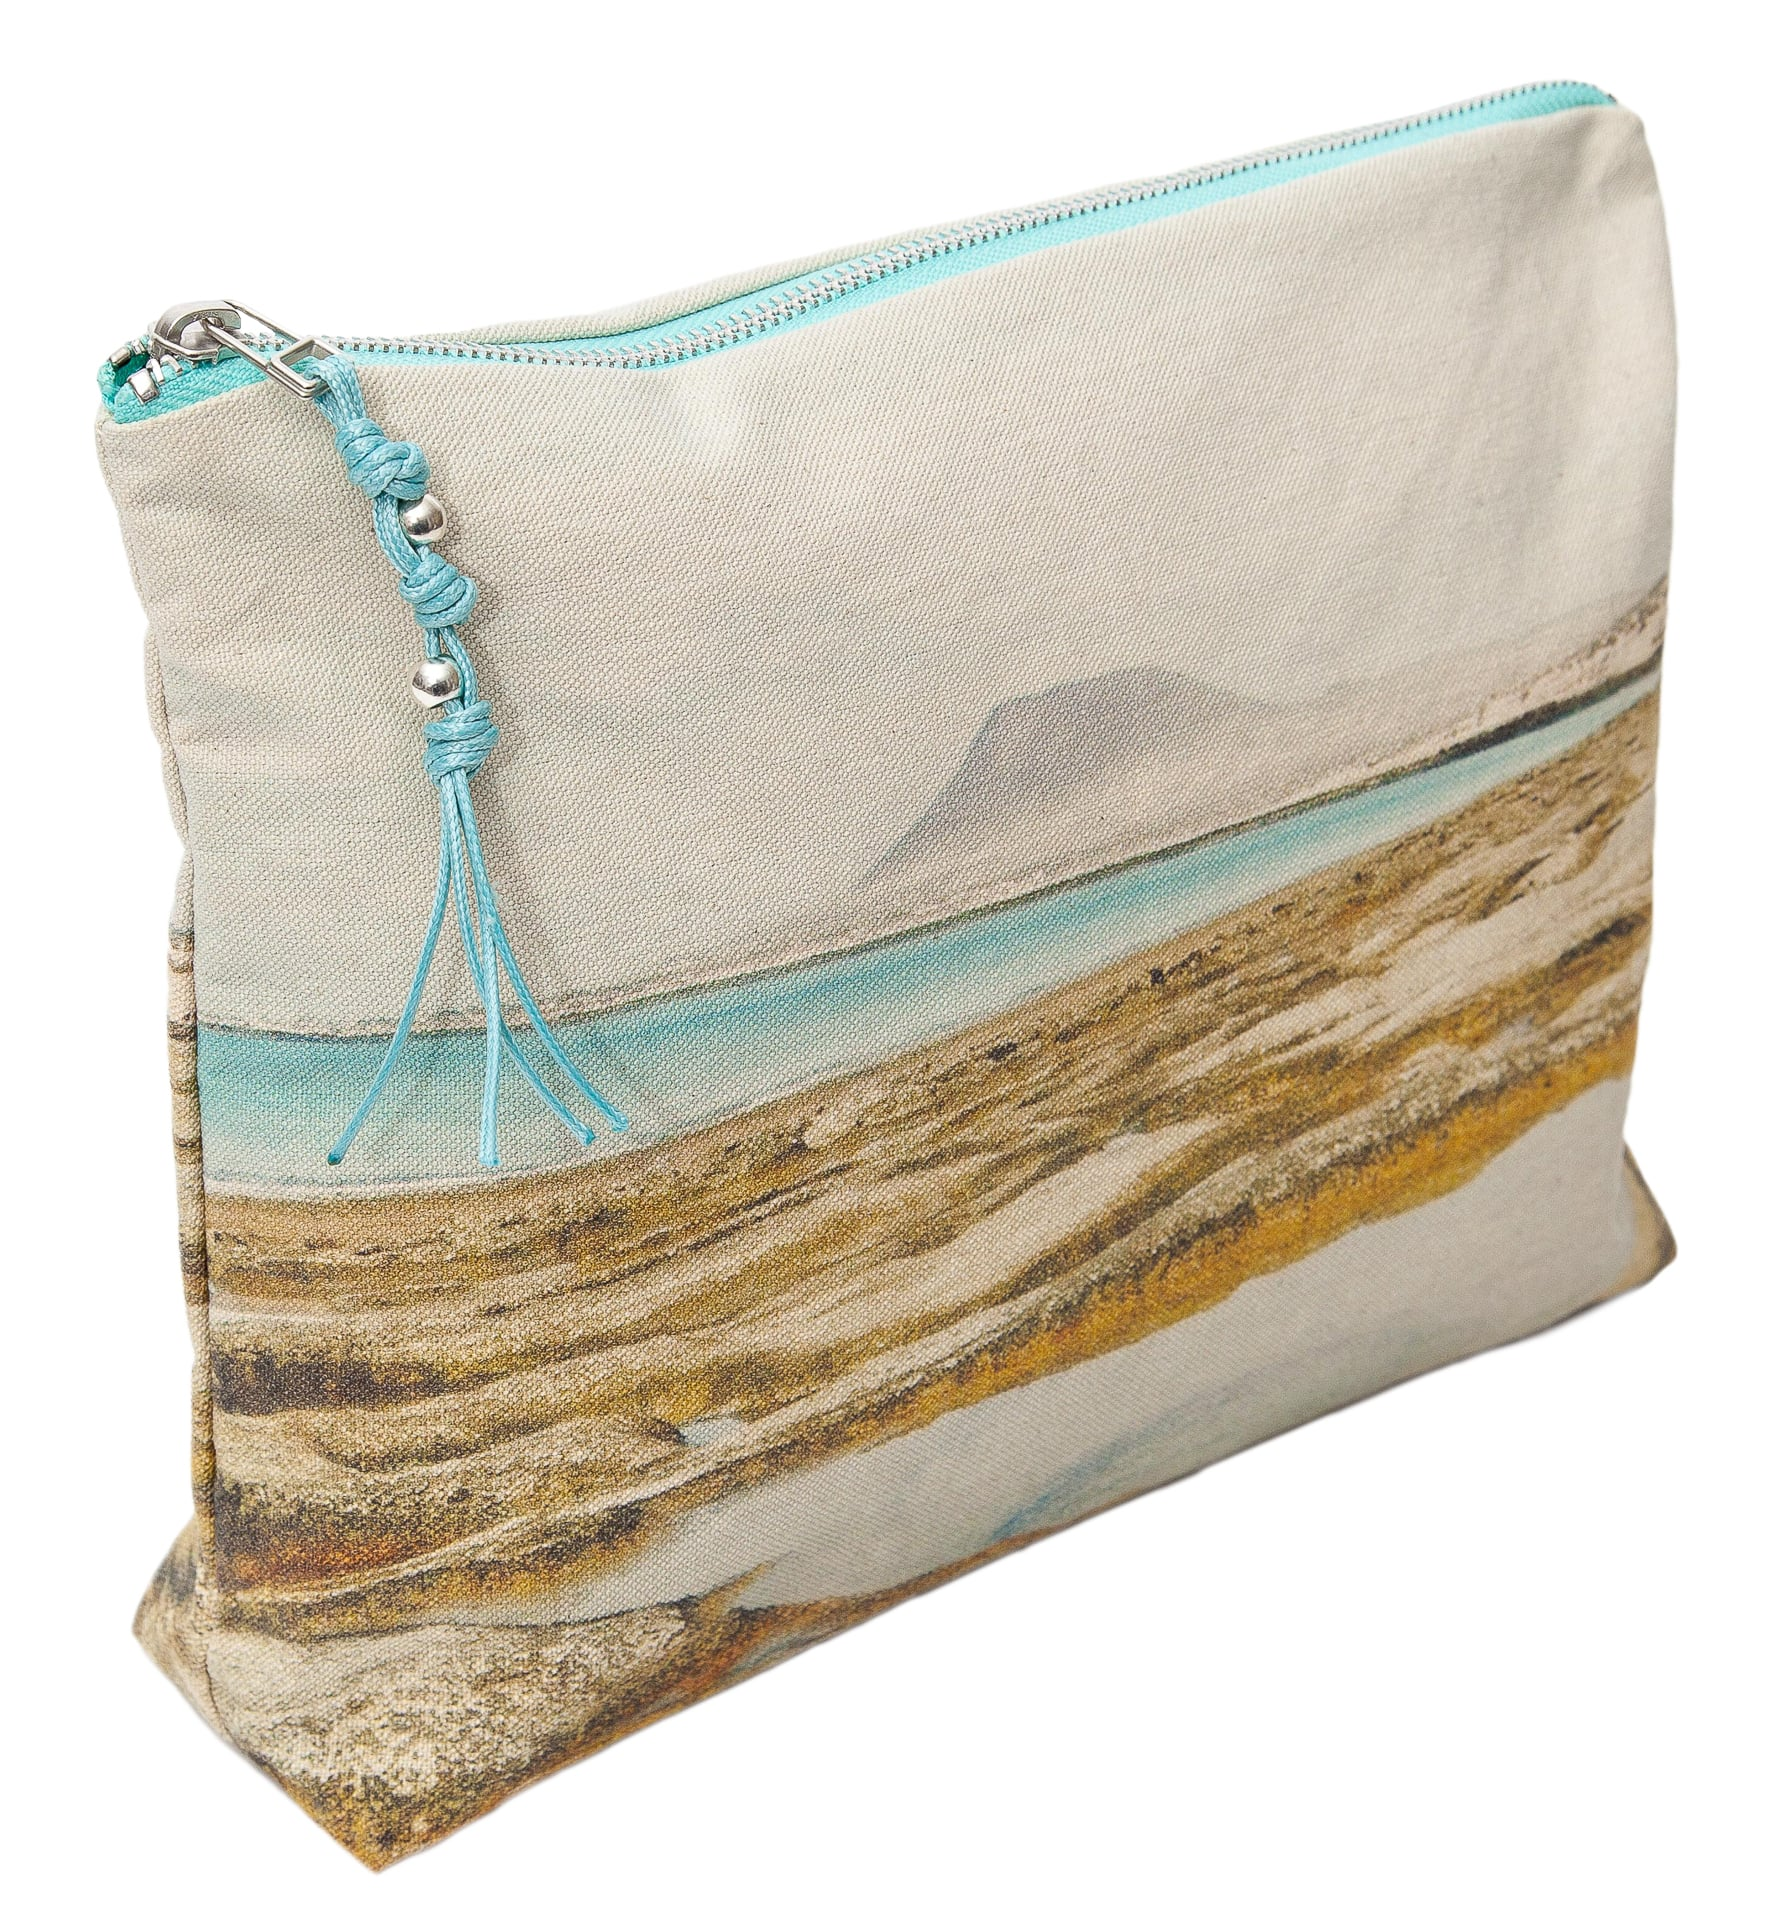 El_Salao-side-pouch